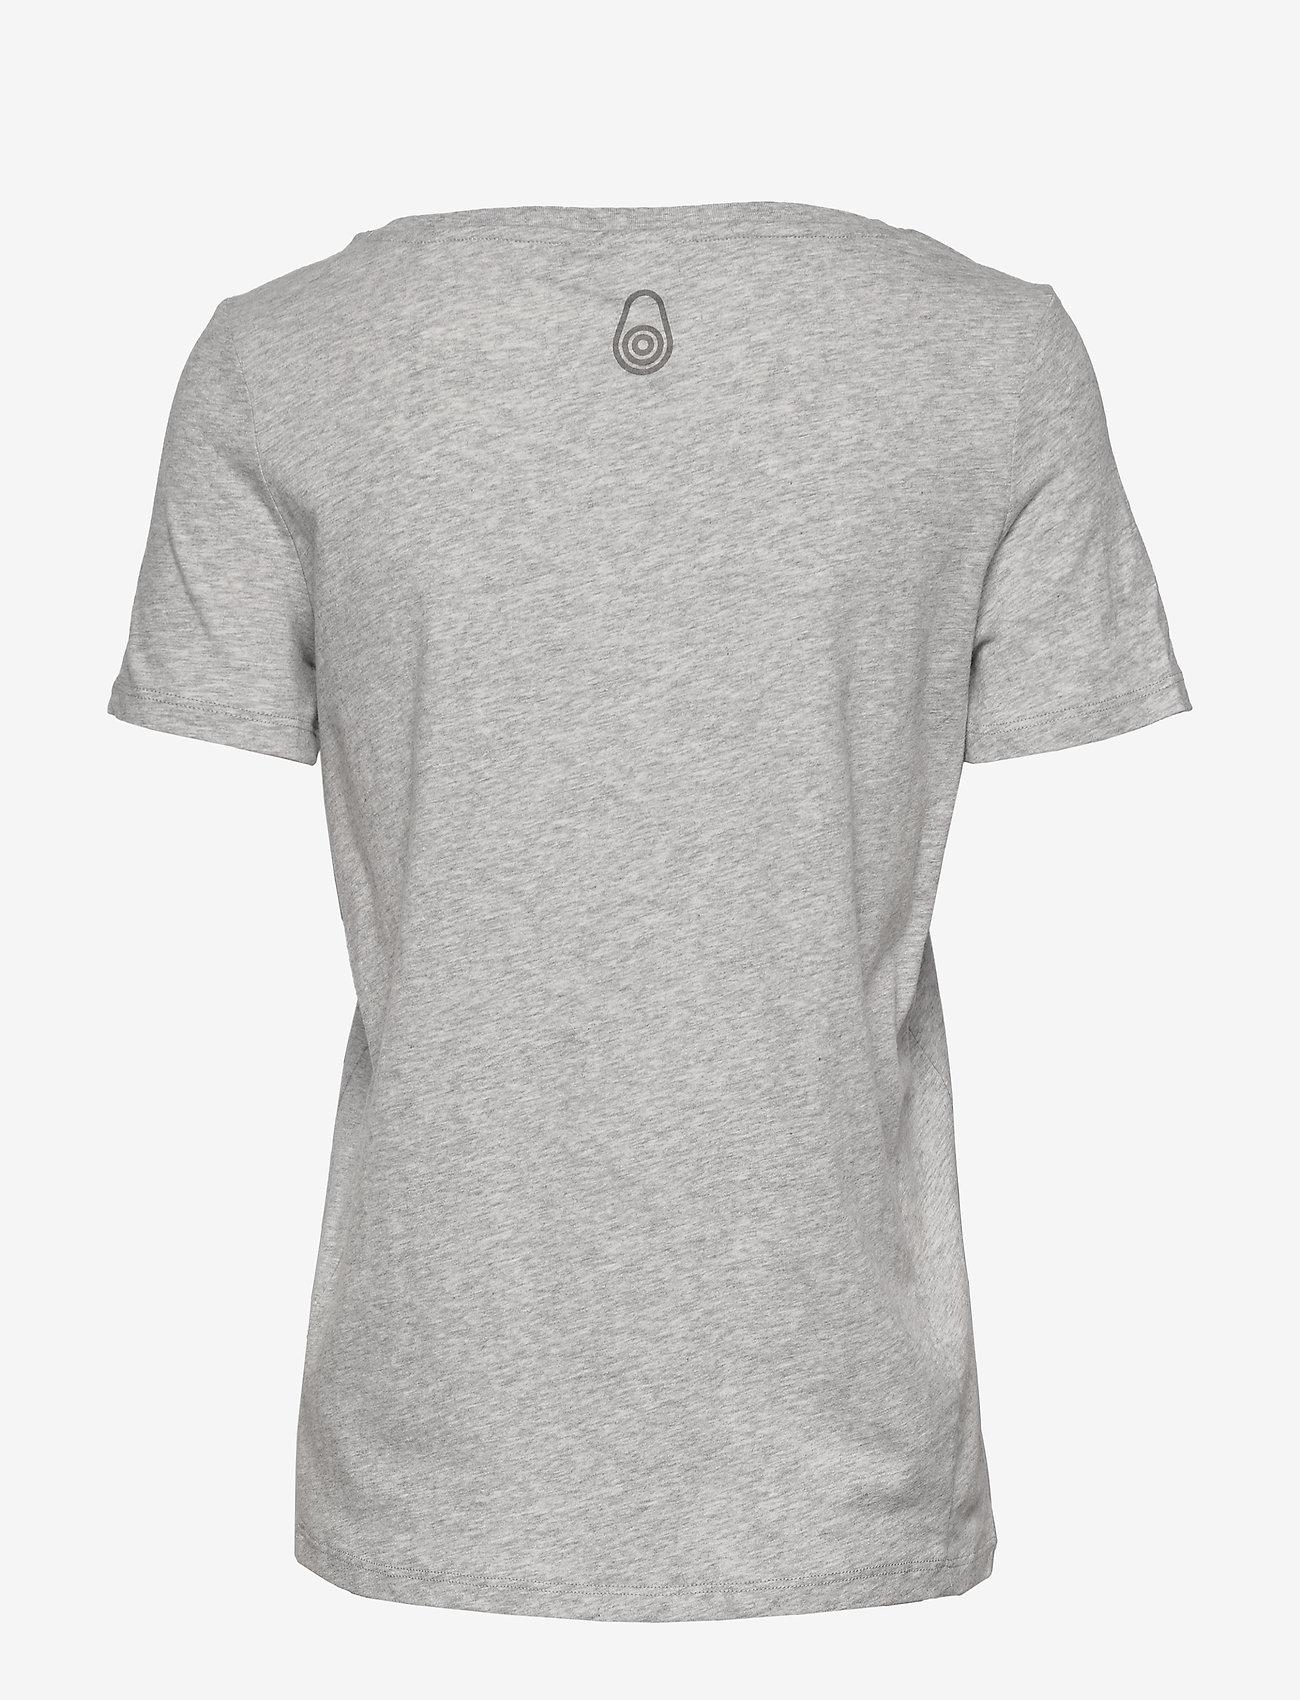 Sail Racing - W GAIL TEE#2 - t-shirts - grey mel - 1